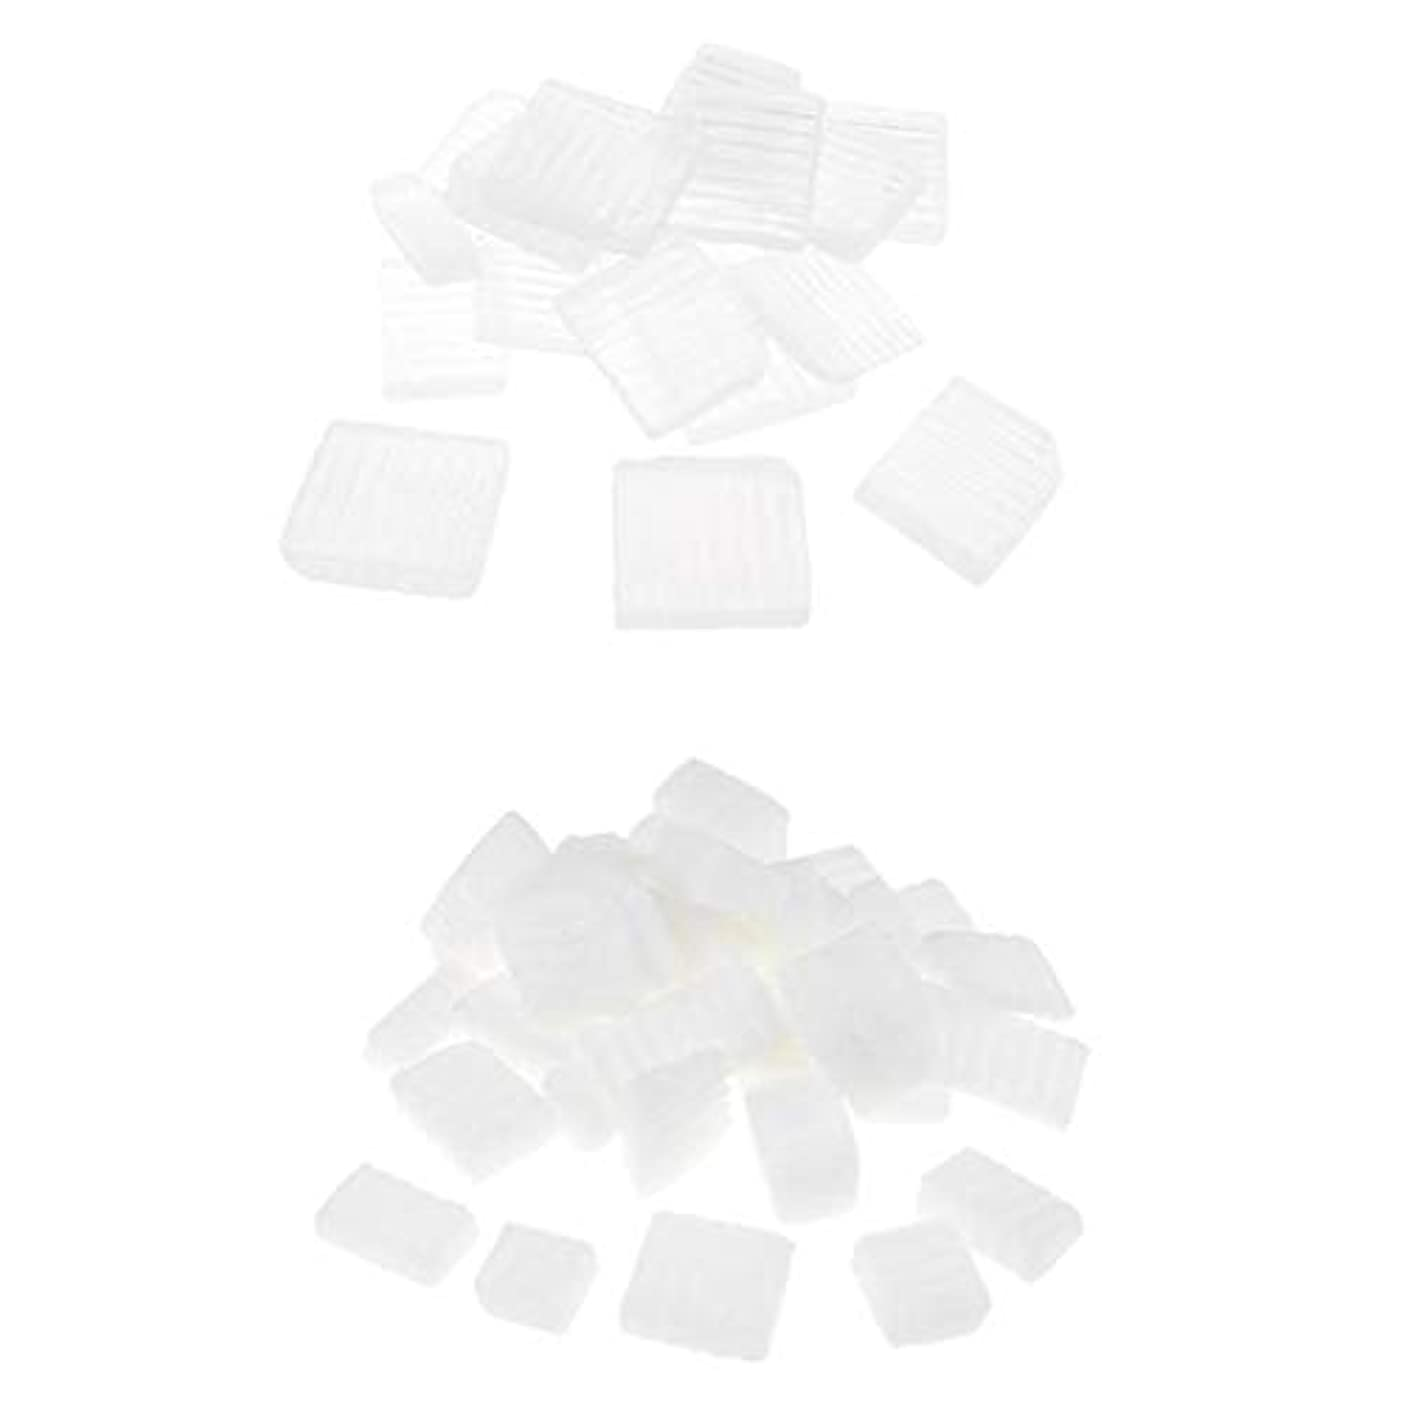 Baoblaze 固形せっけん 2KG 2種 ホワイト 透明 DIYハンドメイド ソープ原料 石鹸製造 古典的